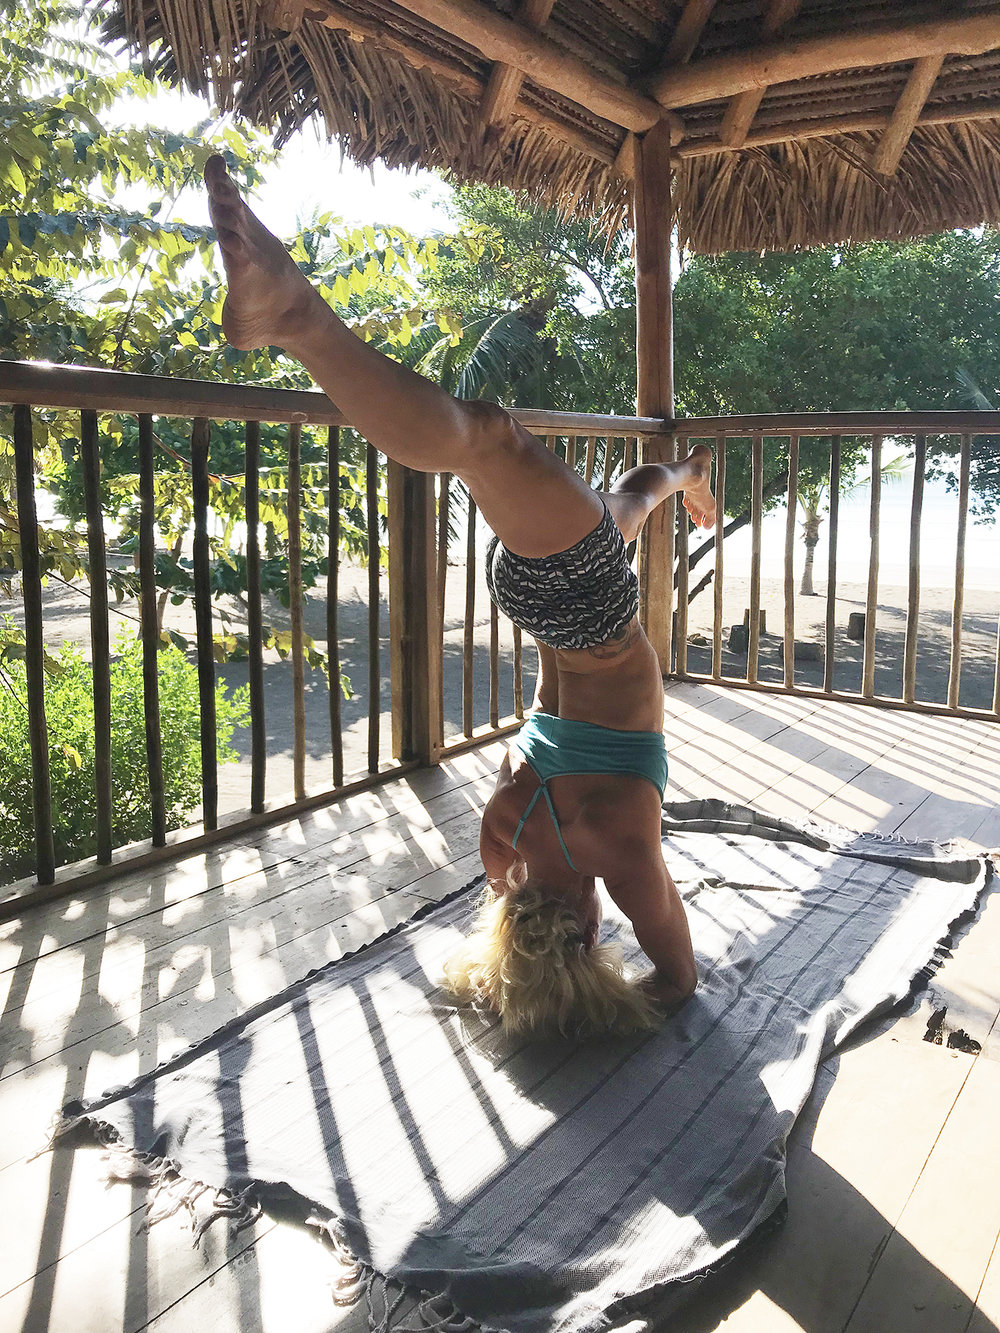 Yoga Ecological Sustainability Tropical Beach Cleanup Retreats Panama Brazil 22.jpg